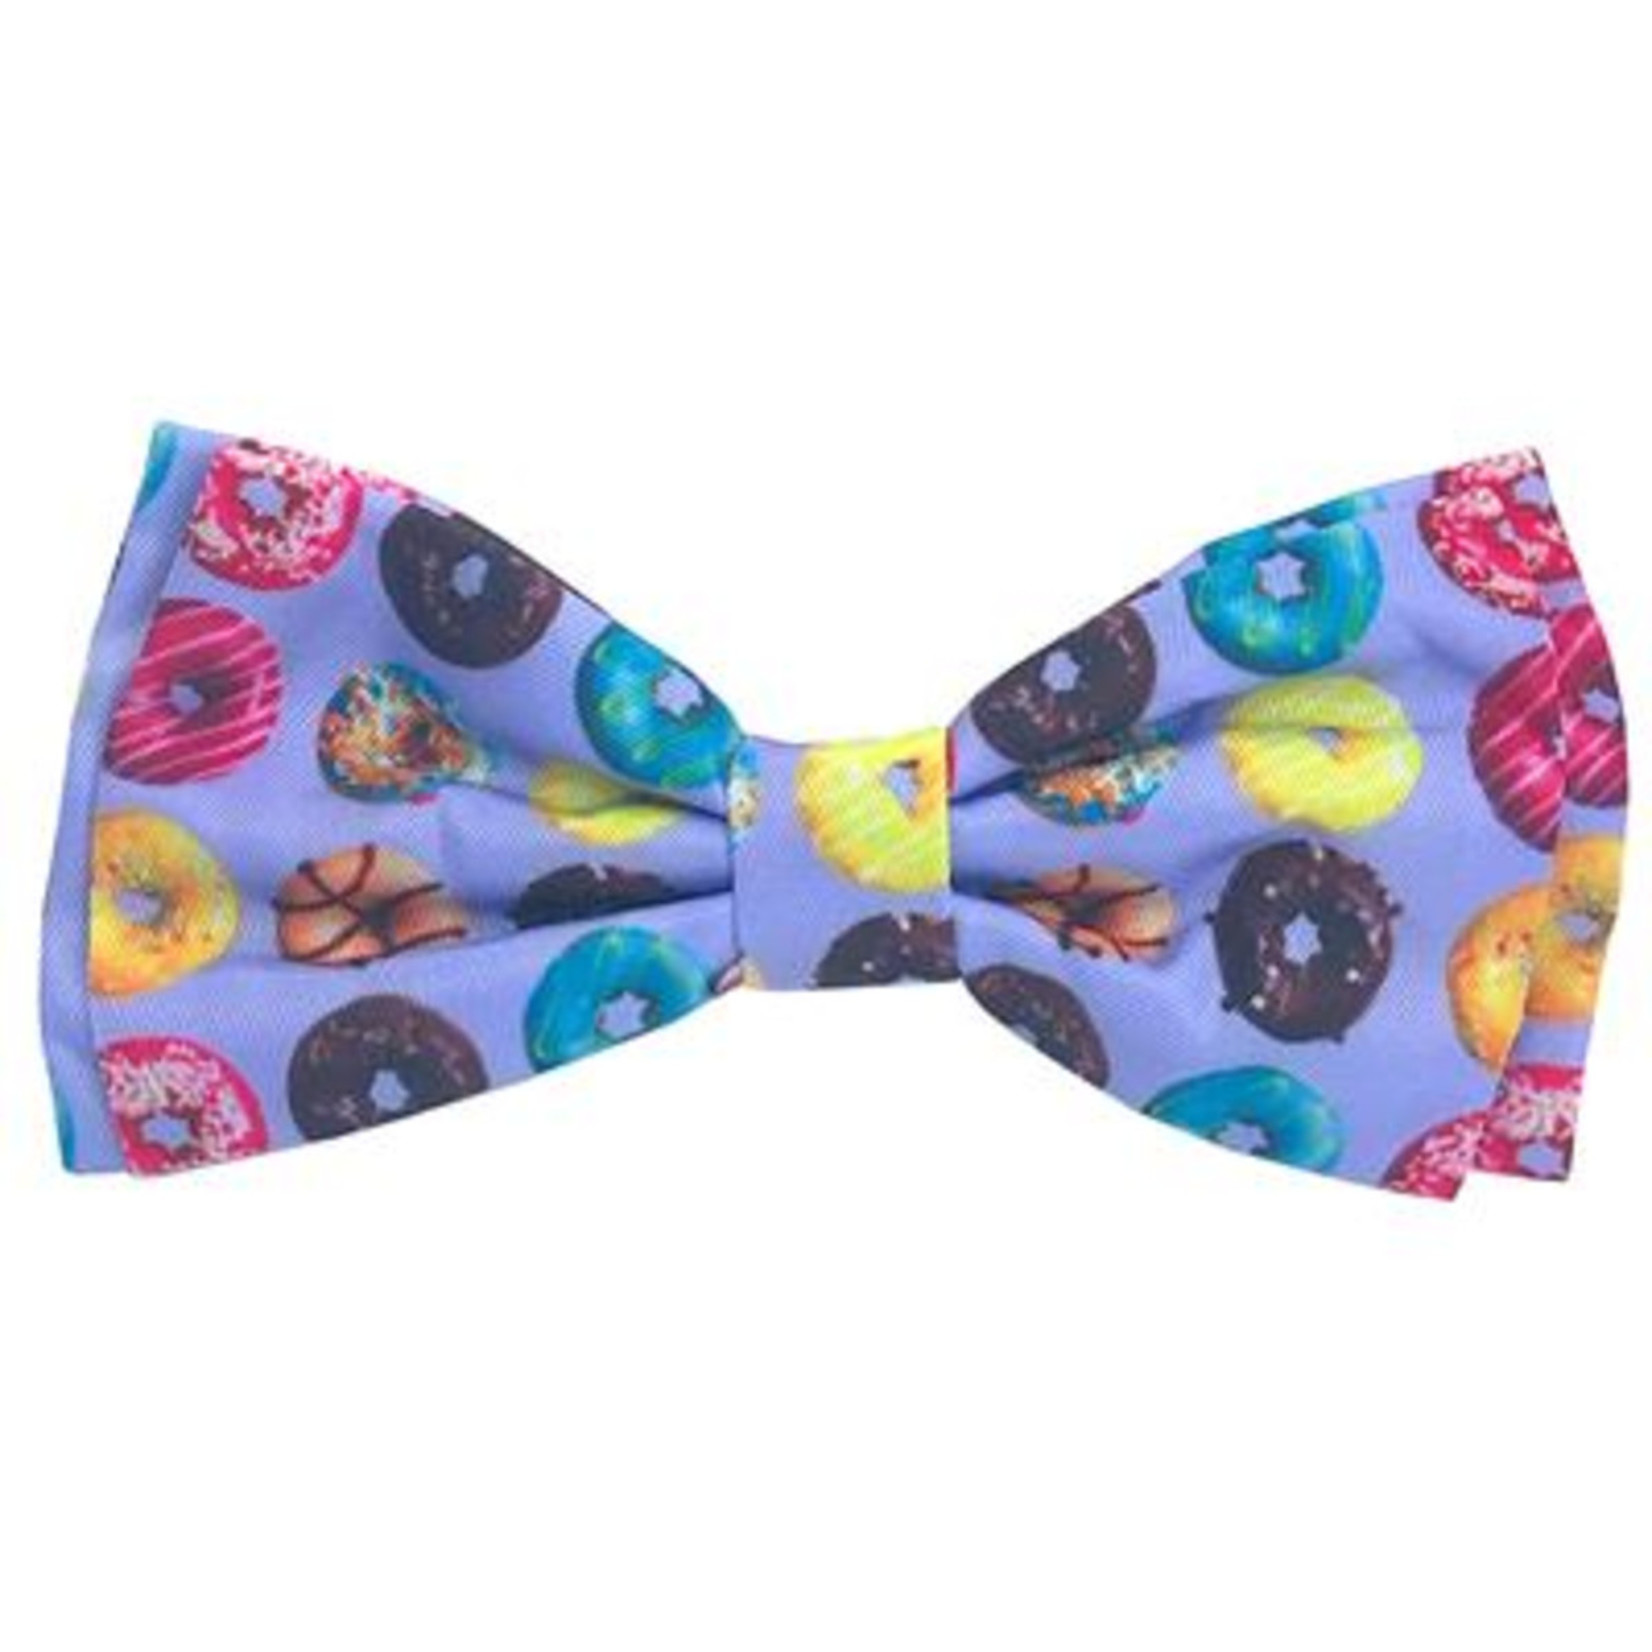 Huxley & Kent H&K Donut Lovers Bow Tie